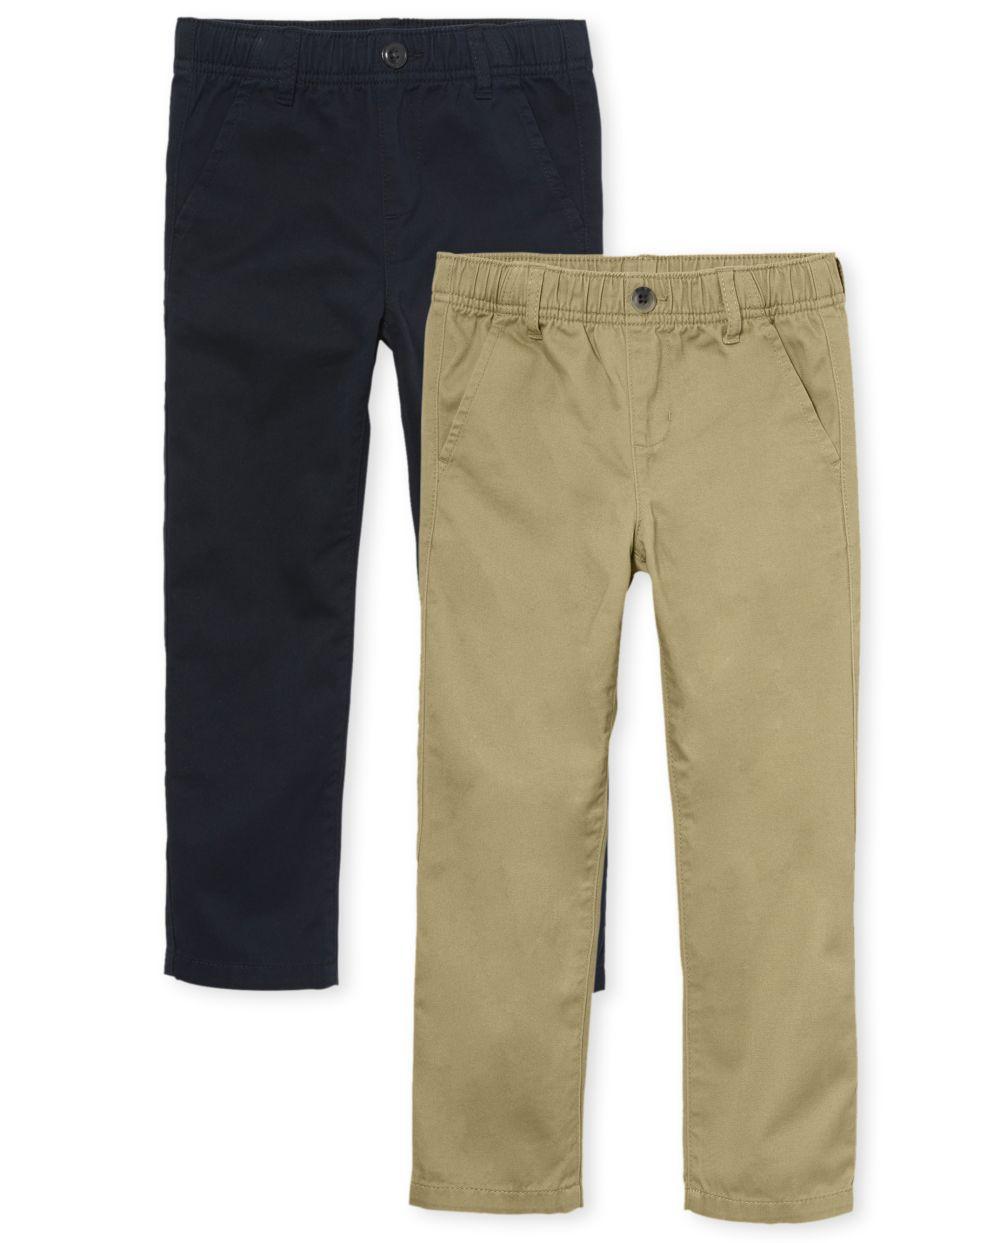 Boys Uniform Pull On Chino Pants 2-Pack - Multi